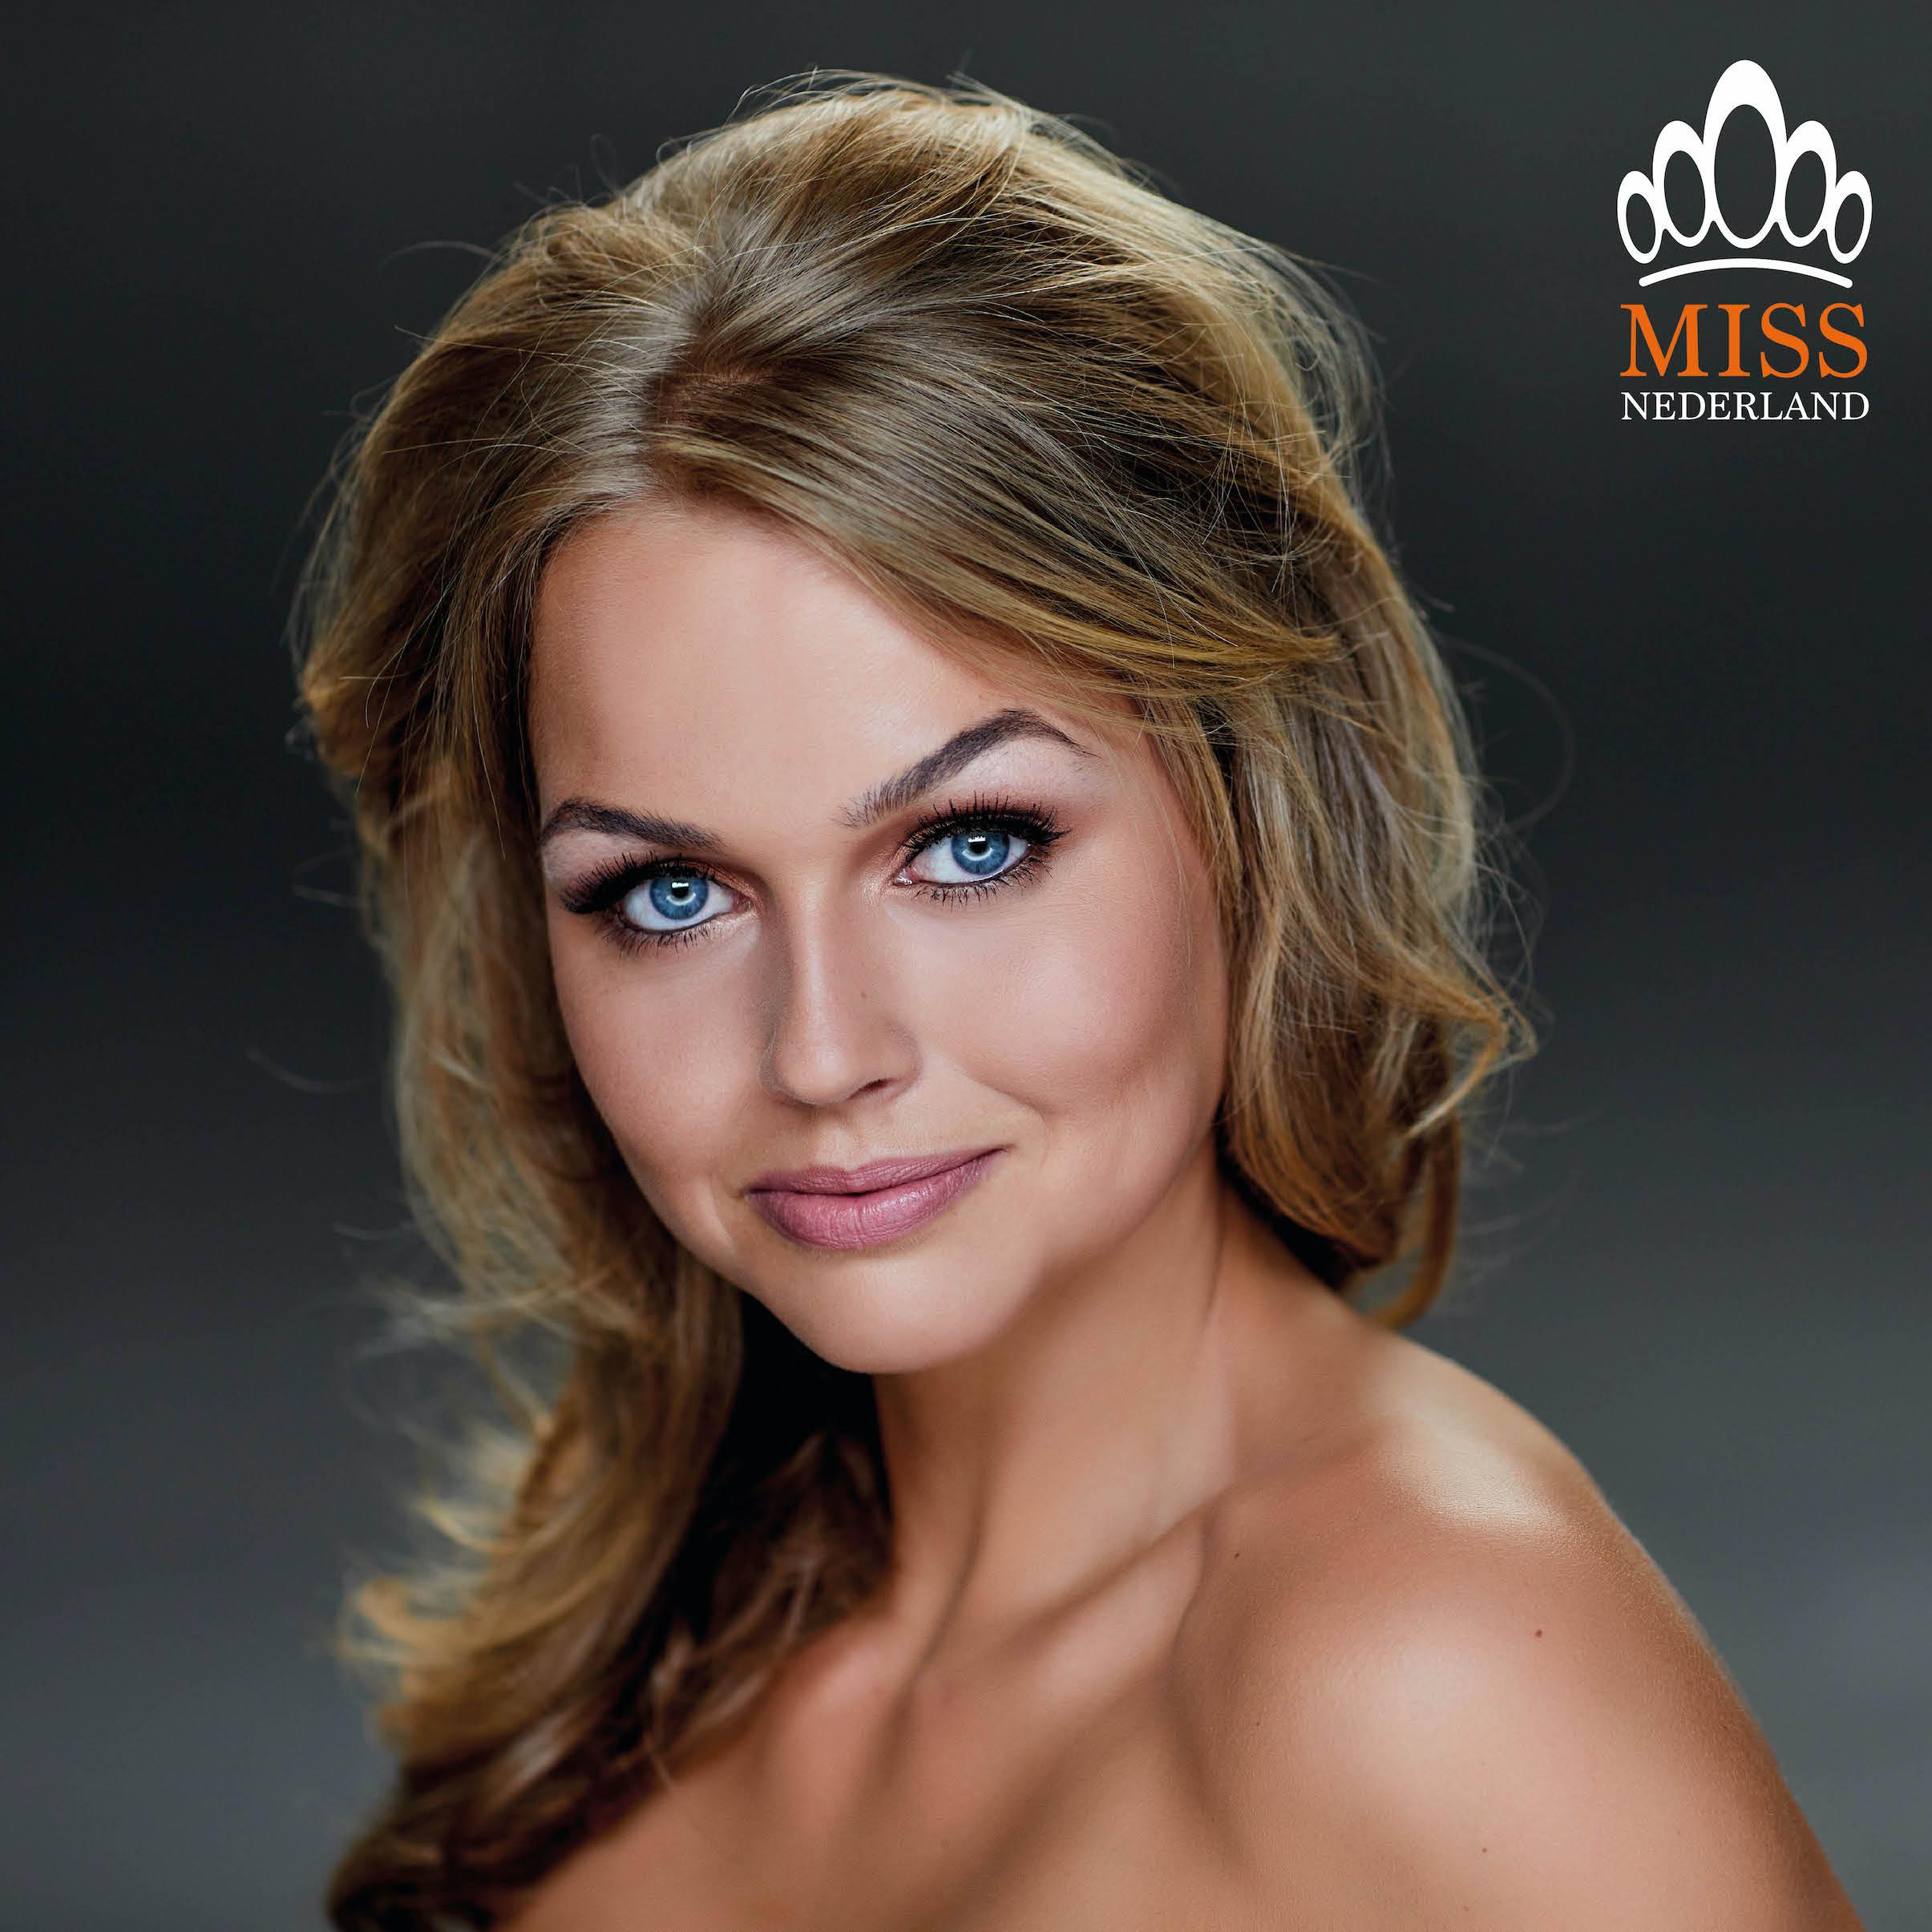 Miss Nederland finalist 2020_Rosalin van Tuijl